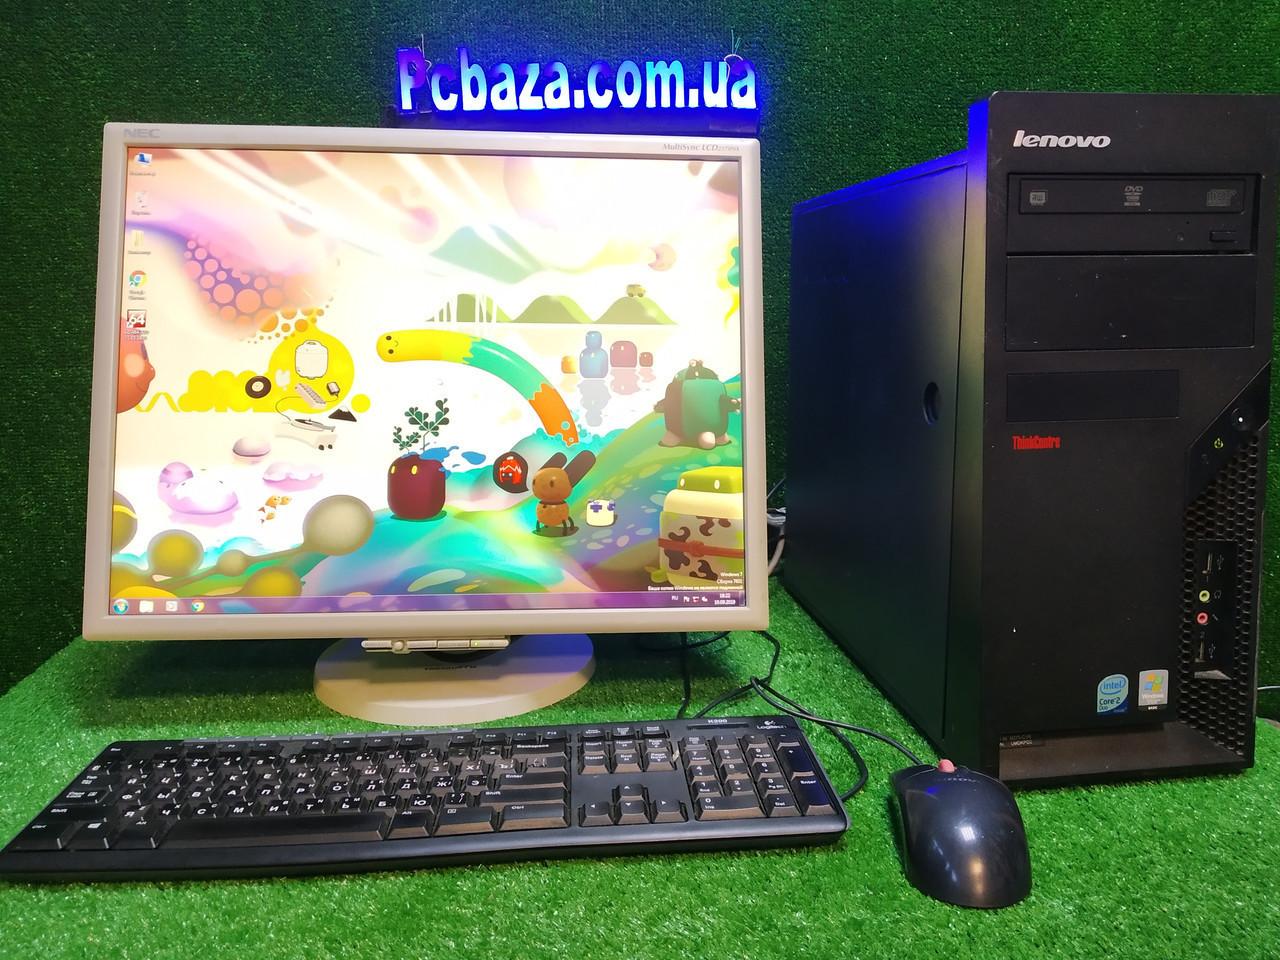 "Комплект игровой Lenovo, 4 ядра, 4 ГБ, 500 Гб HDD, ATI HD 7570 1GB+PVA  монитор 22"" NEC( комфортный для глаз)"